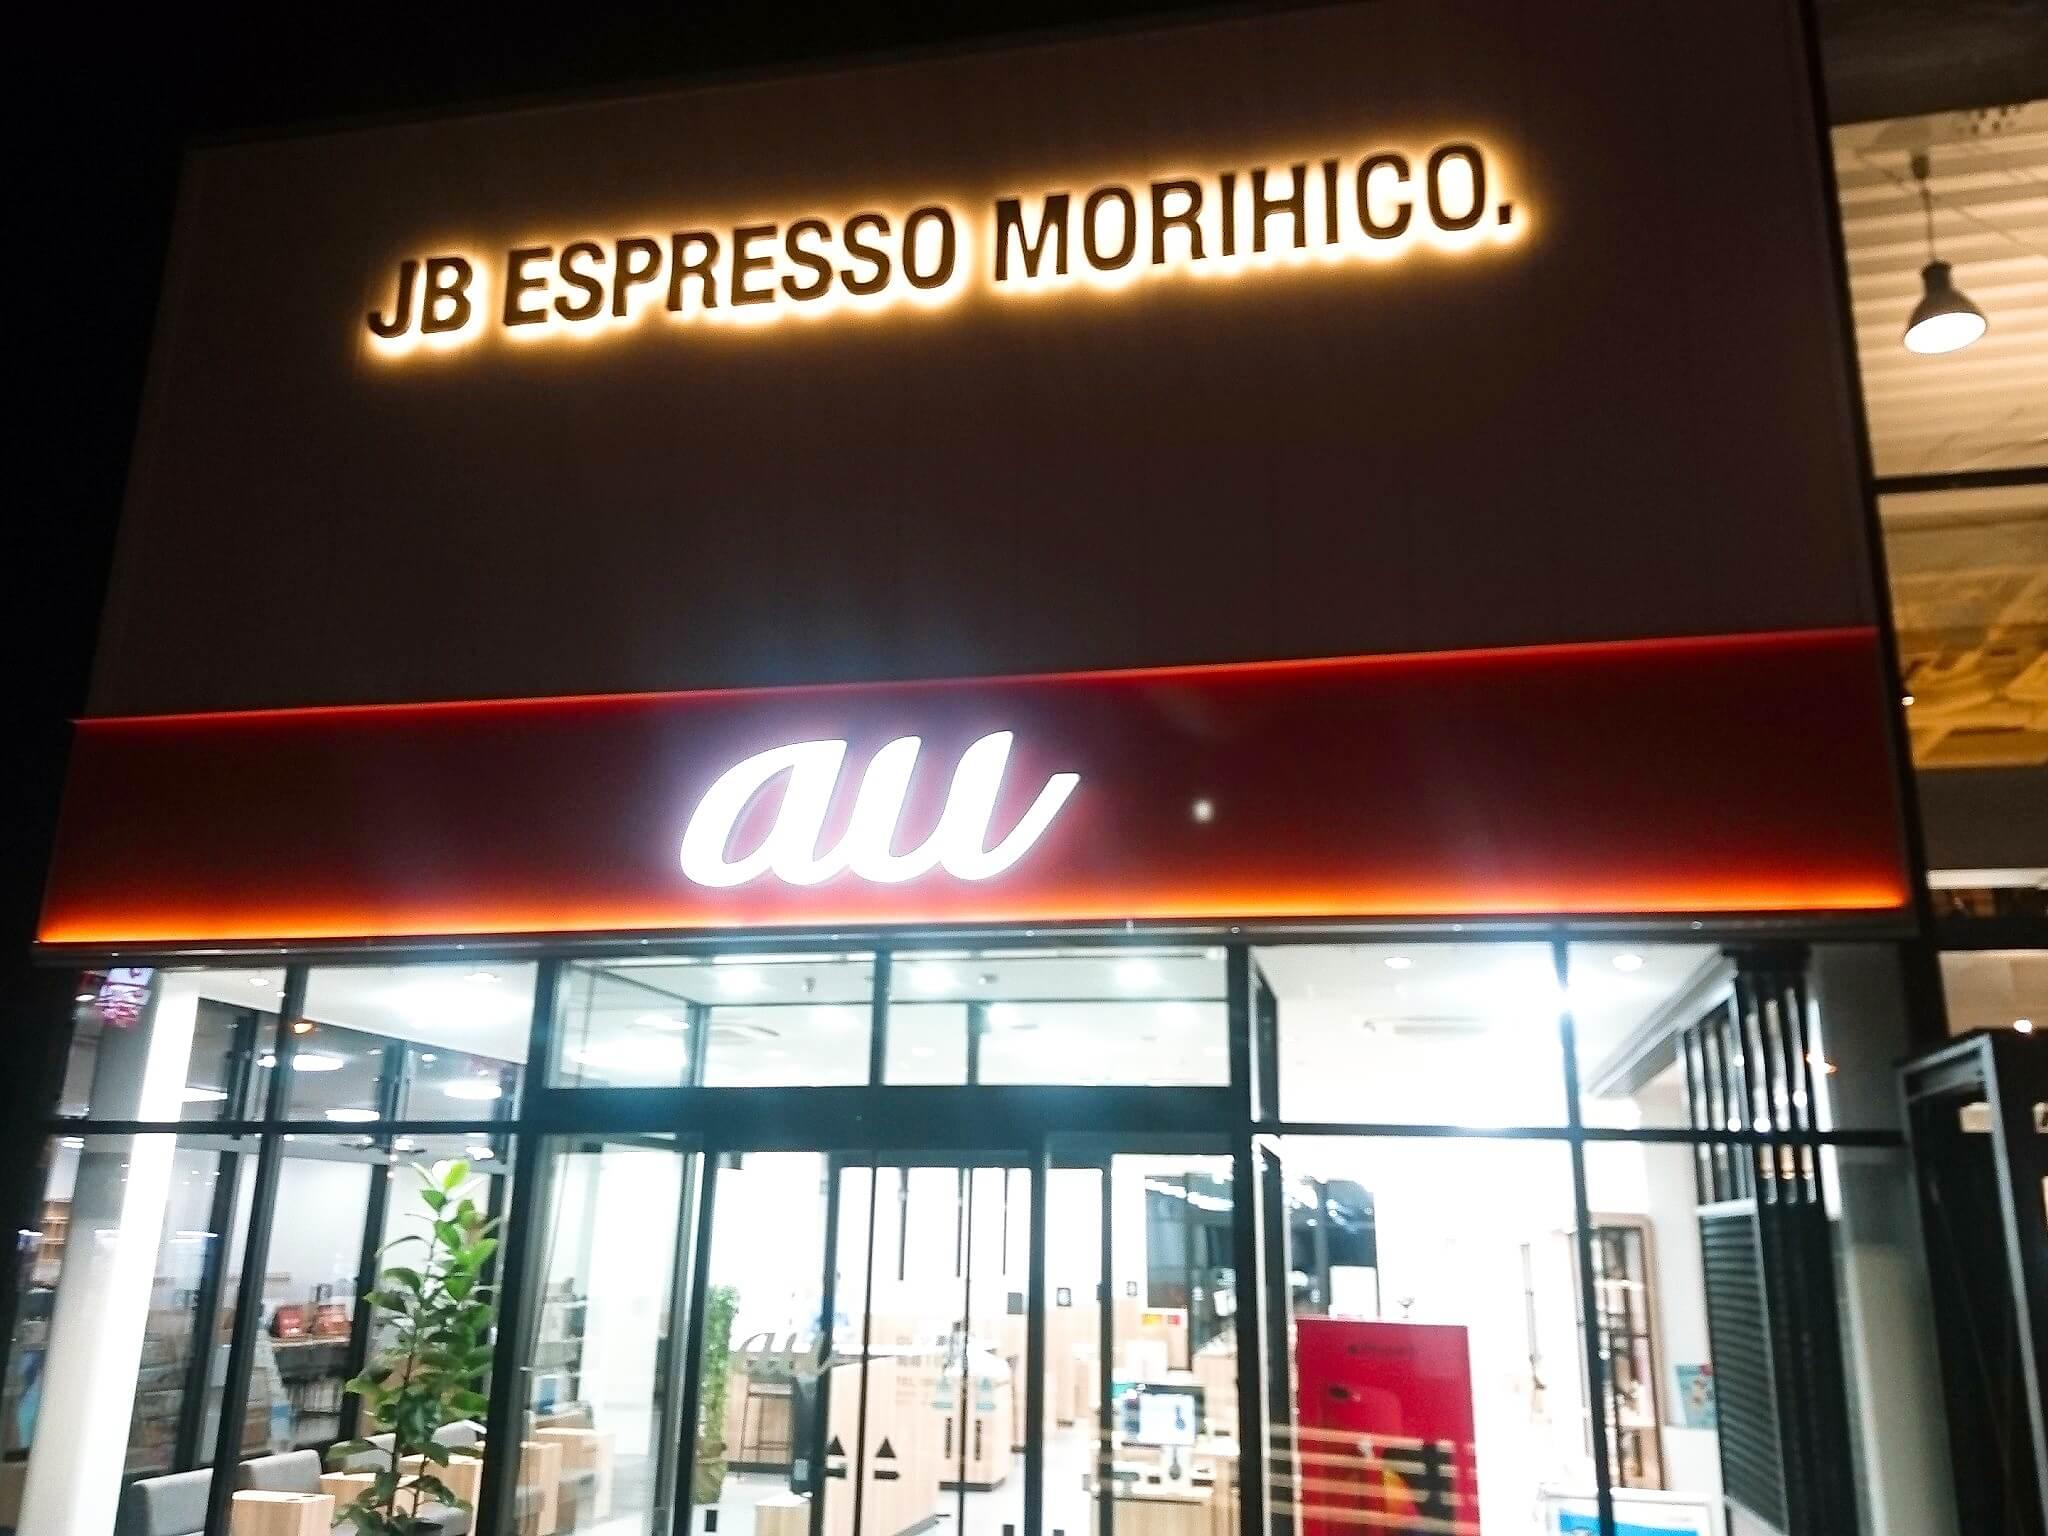 JB ESPRESSO MORIHICO.サイクルロード 外観